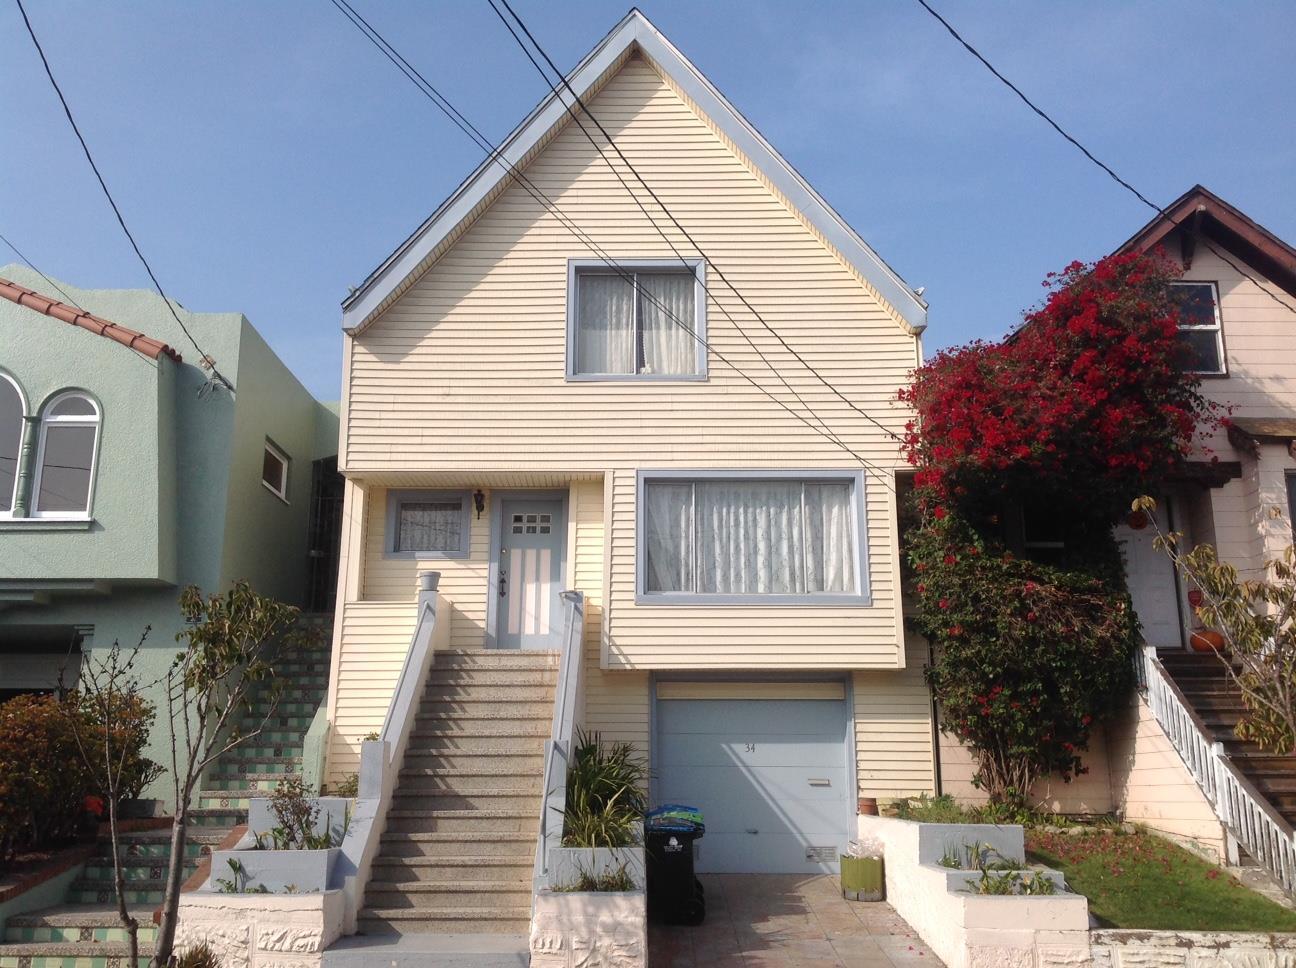 Image for 34 Wanda Street, <br>San Francisco 94112